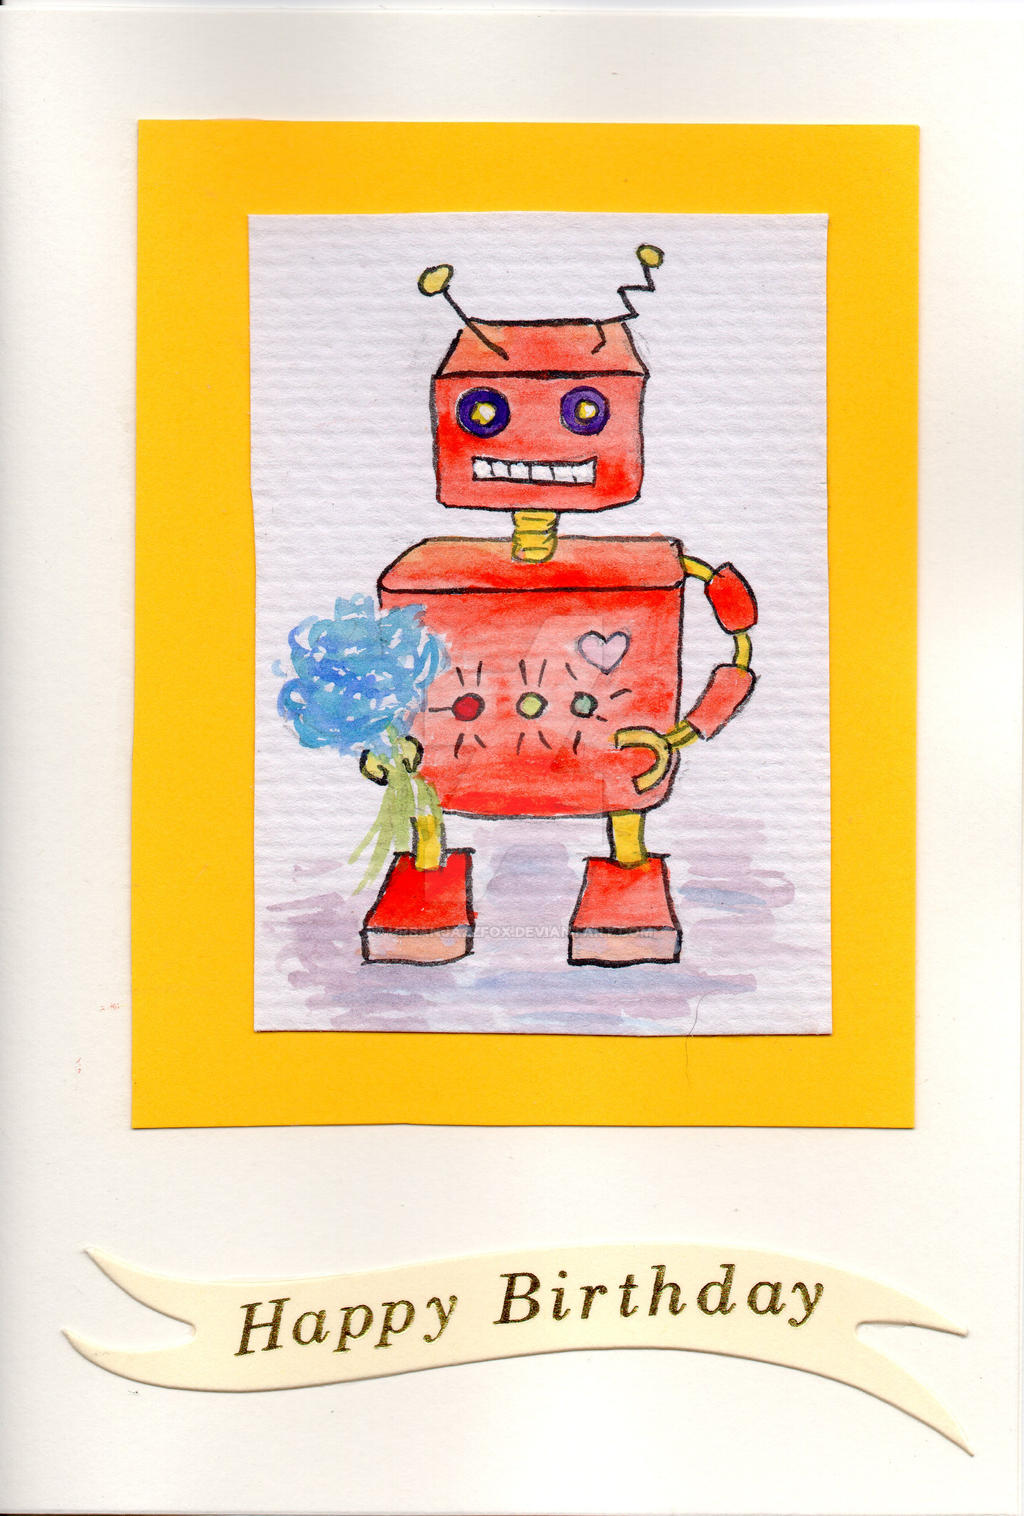 Birthday Robot #2 by UrbanJazzFox